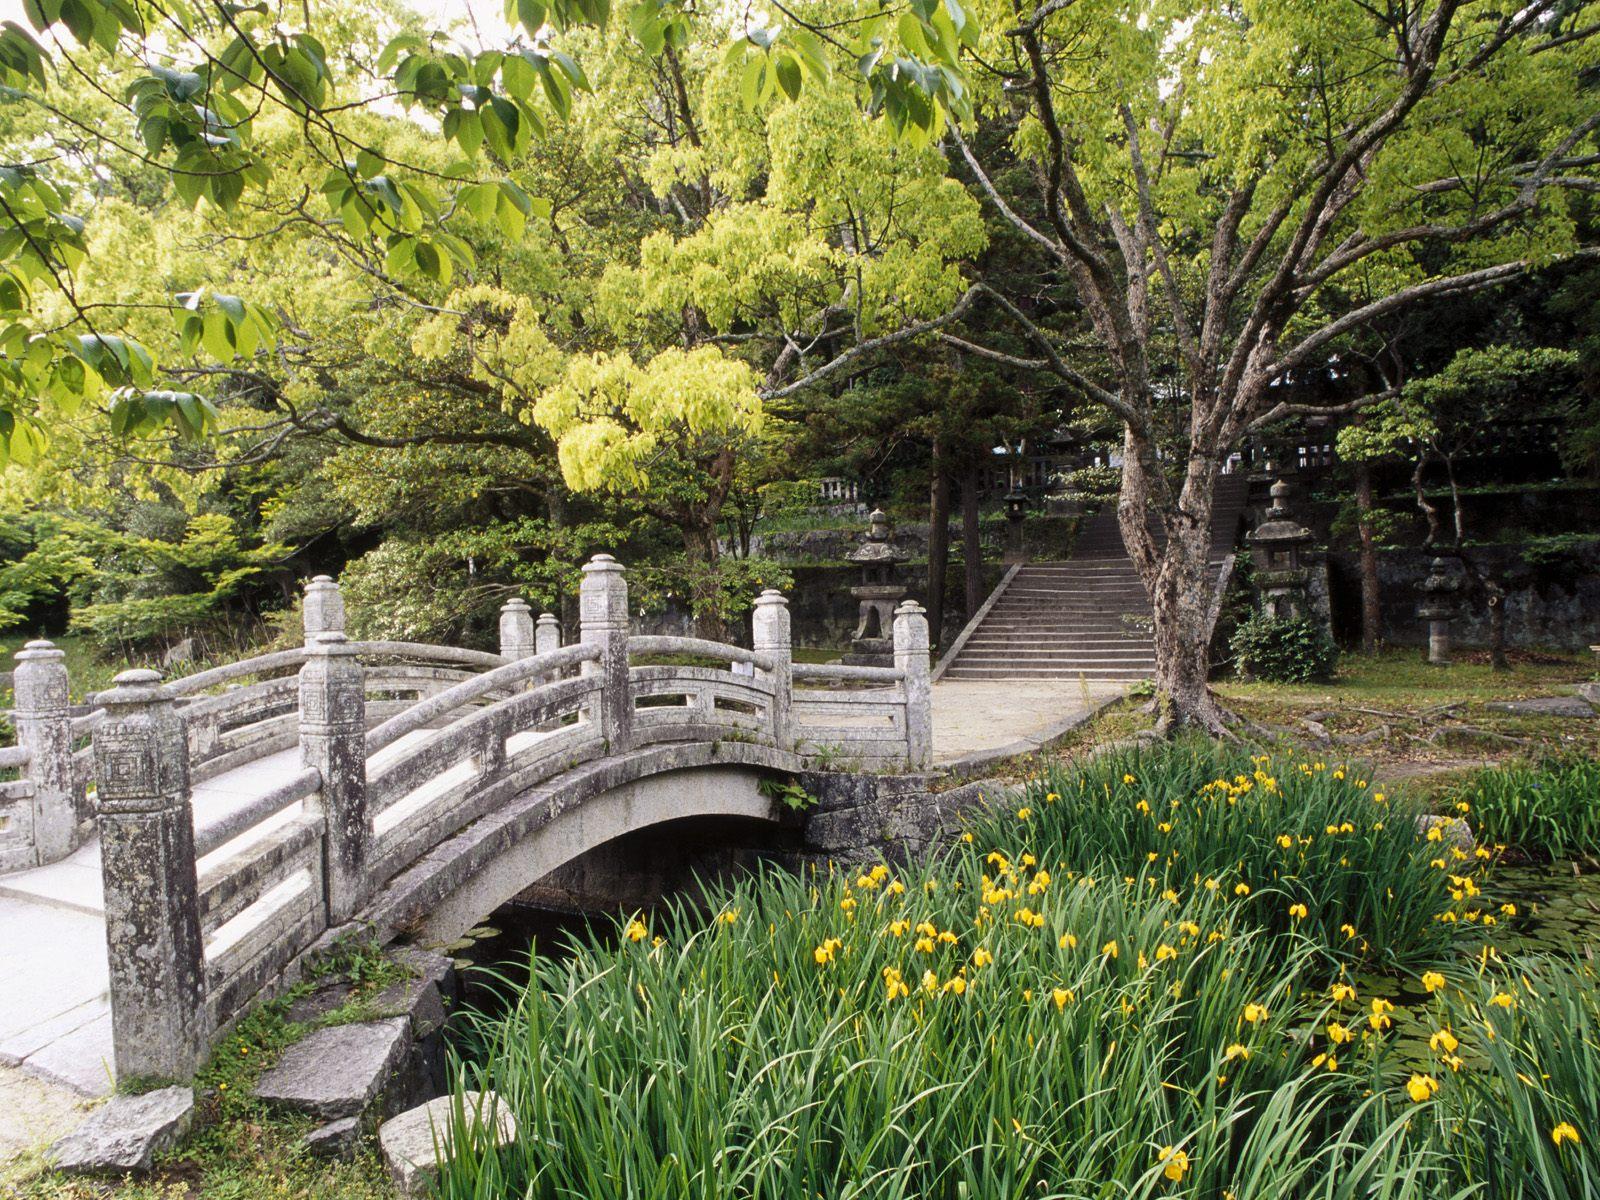 http://4.bp.blogspot.com/-lko5wio3TjU/TggCsvxbA8I/AAAAAAAAAsk/NJGd7aHxqHo/s1600/Hagi-Castle-Garden-Western-Honshu-Japan.jpg